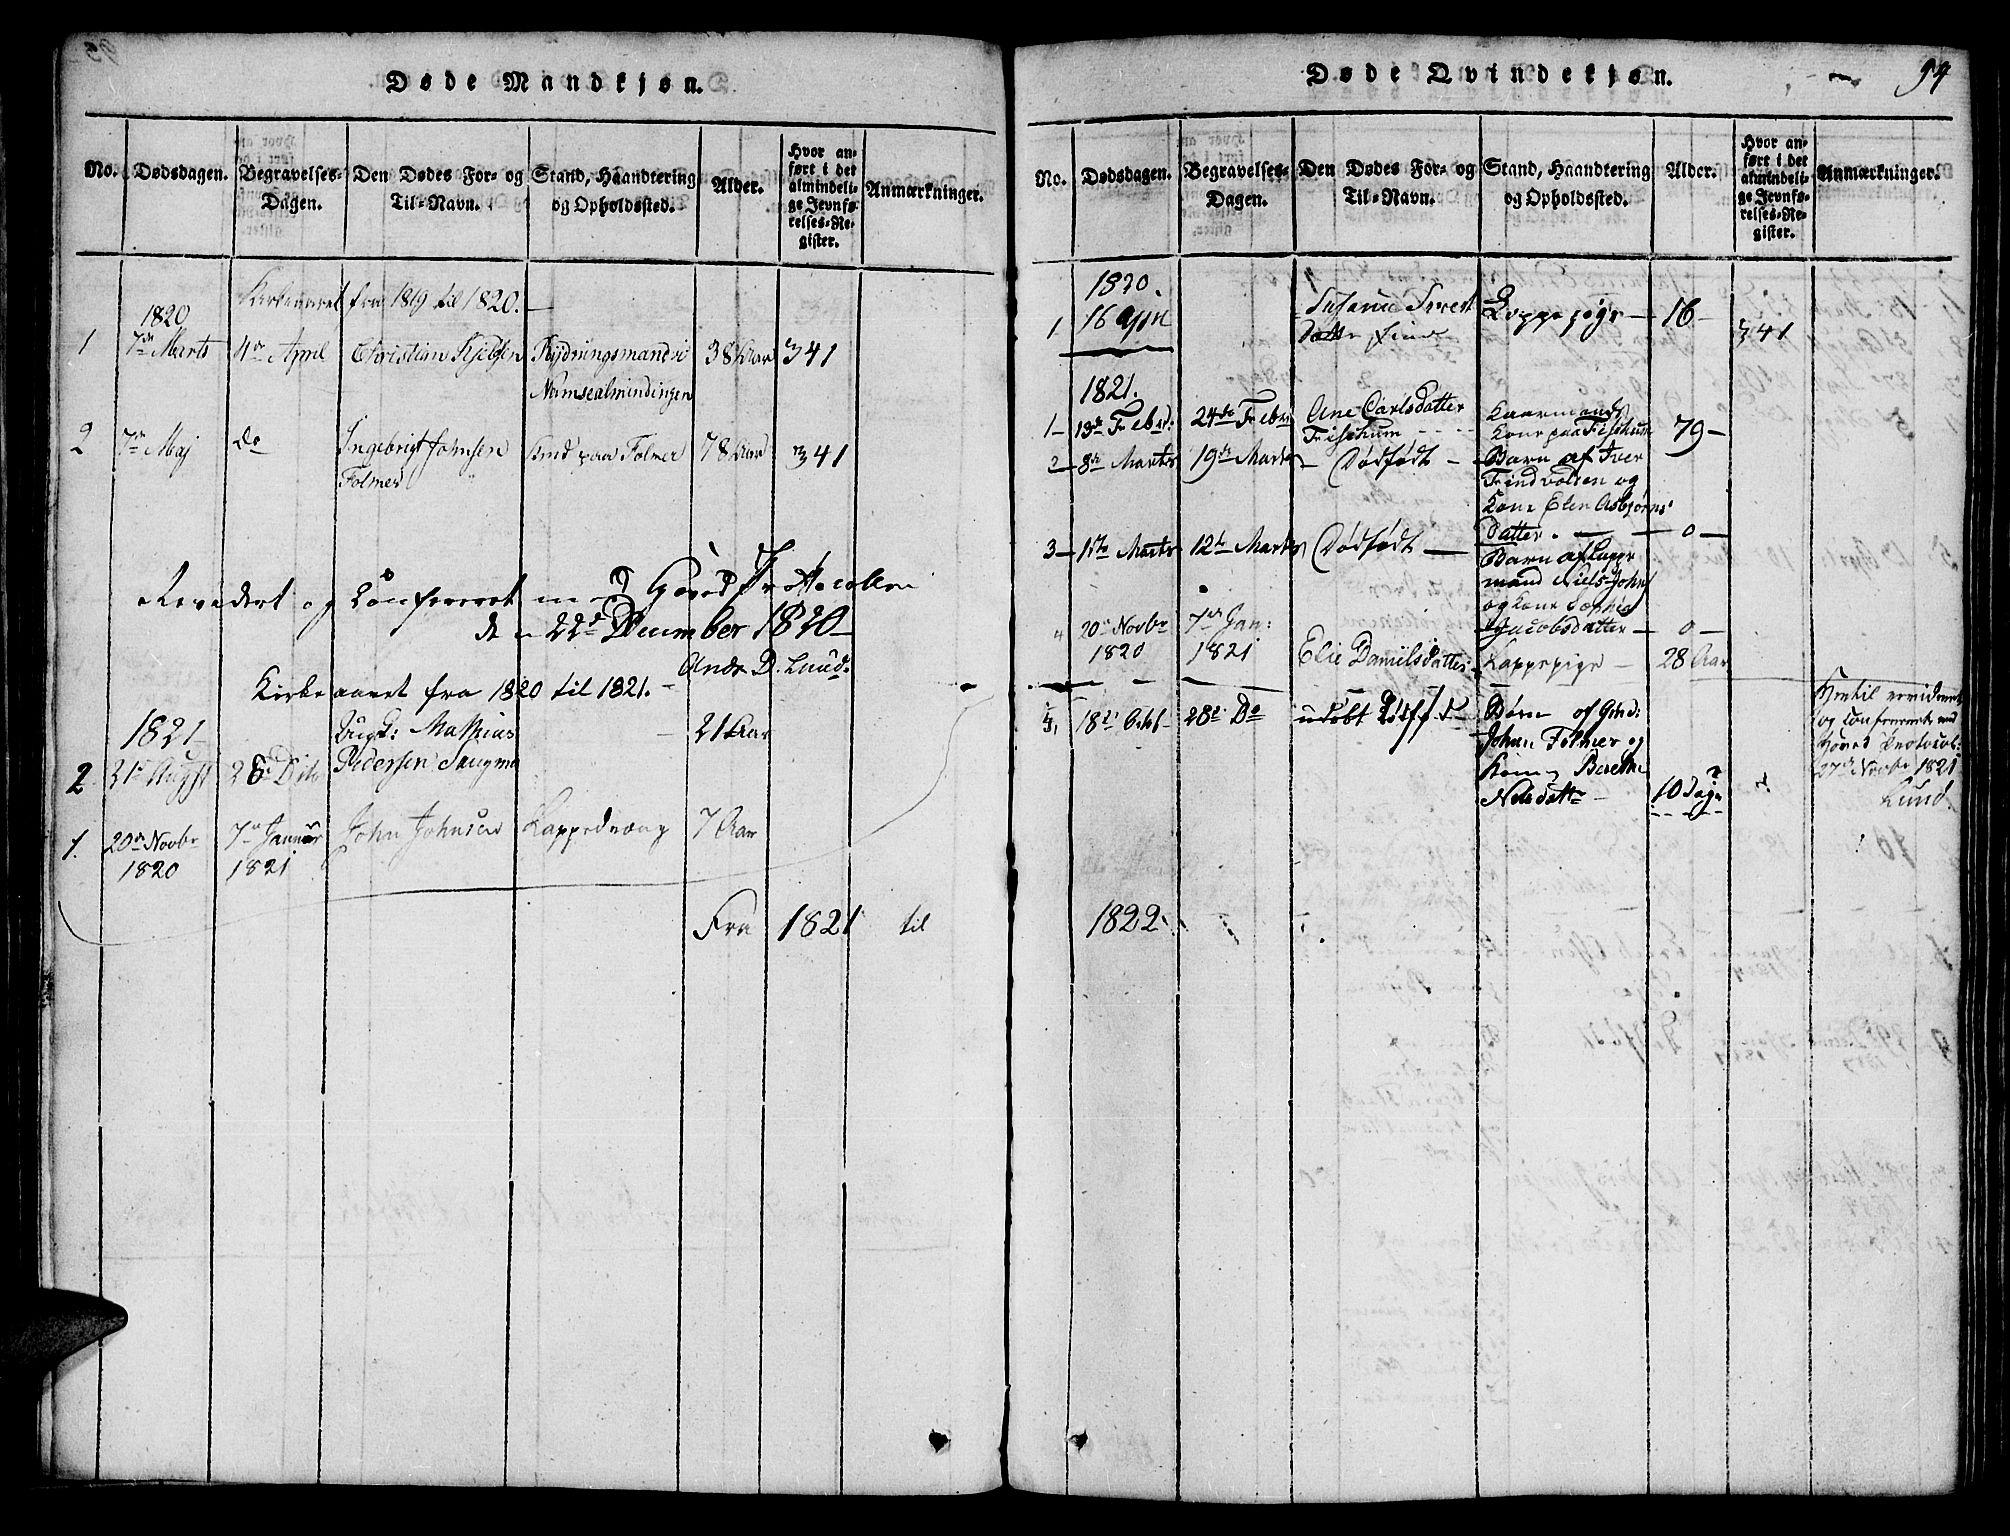 SAT, Ministerialprotokoller, klokkerbøker og fødselsregistre - Nord-Trøndelag, 759/L0527: Klokkerbok nr. 759C01 /1, 1816-1825, s. 94a